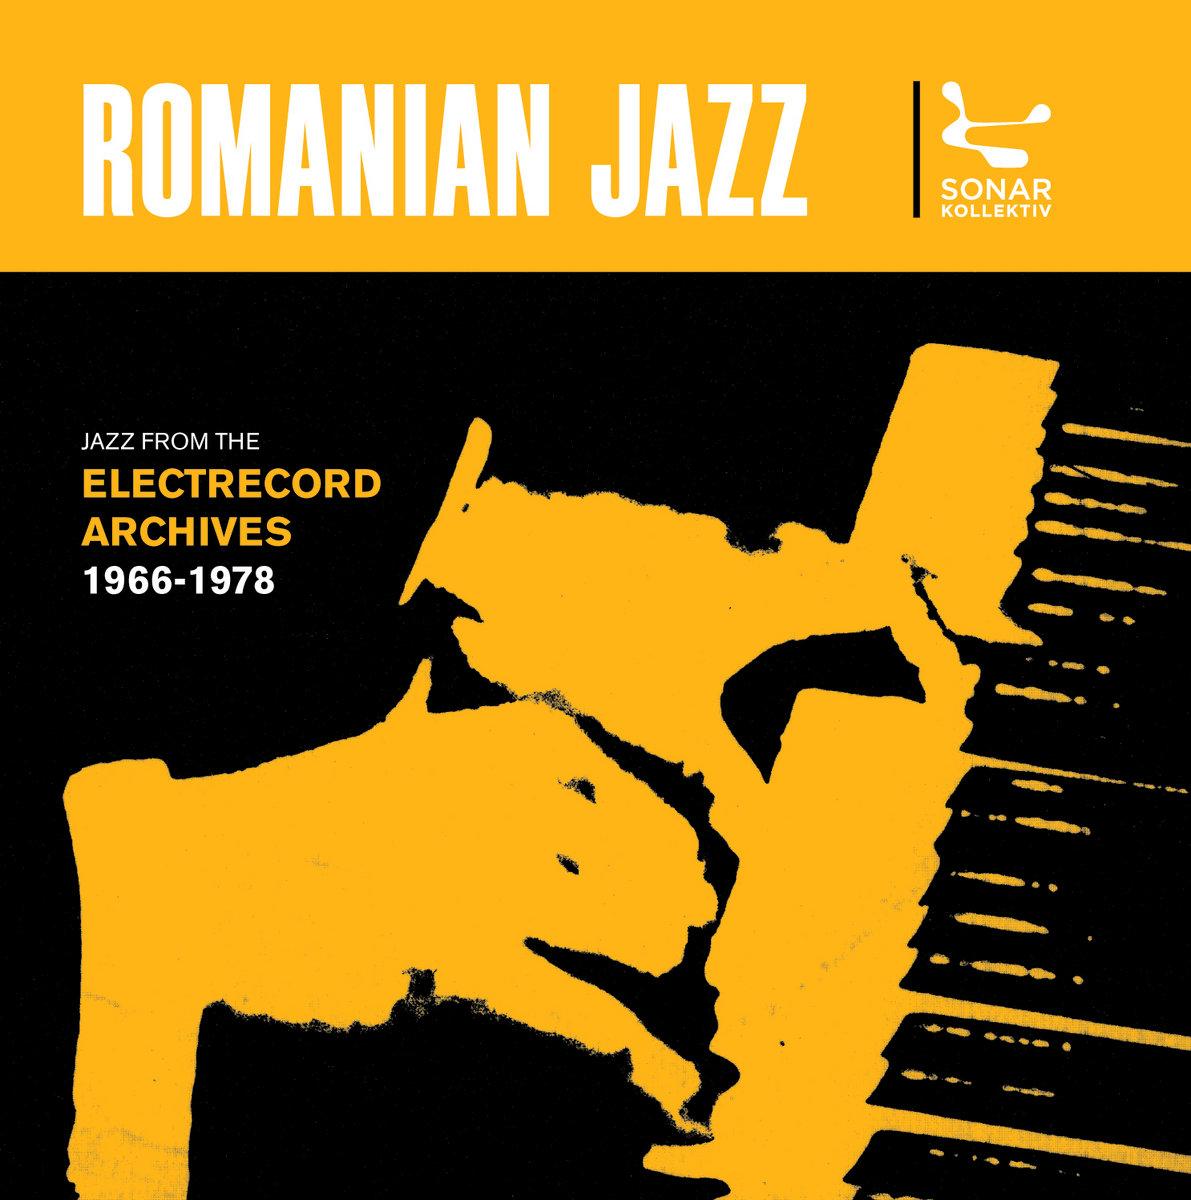 Romanian Jazz Jazz From The Electrecord Archives 1966 1978 Compiled By Jazzanova High Quality Master Various Artists Sonar Kollektiv